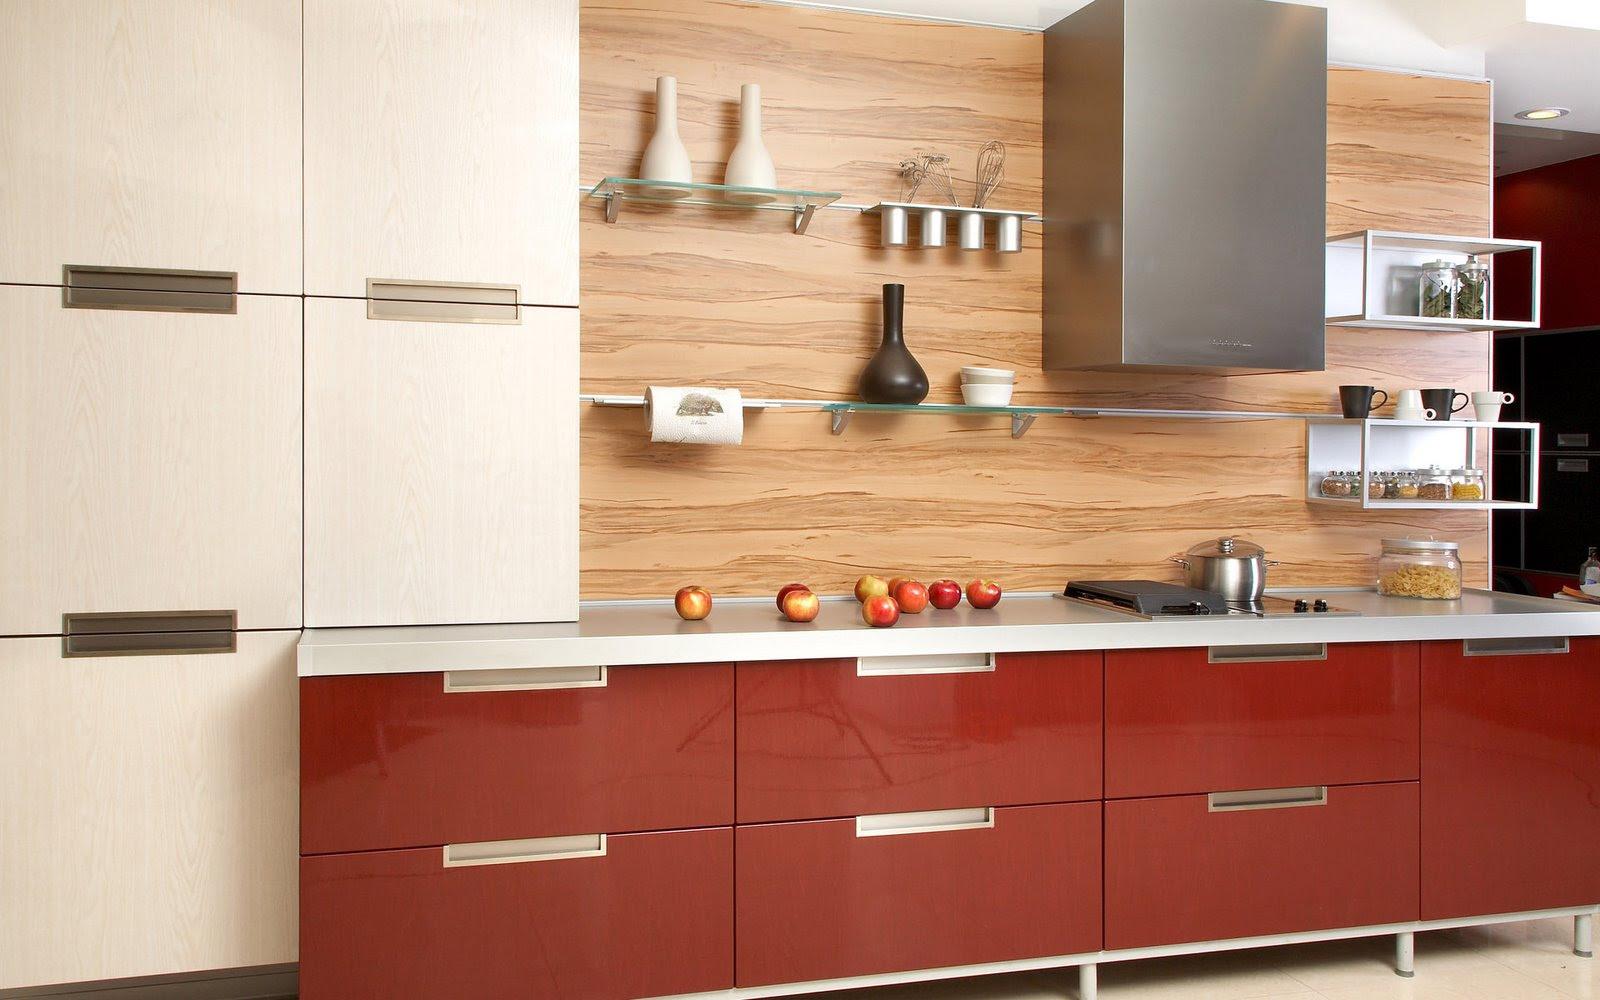 30 Modern Kitchen Design Ideas - The WoW Style